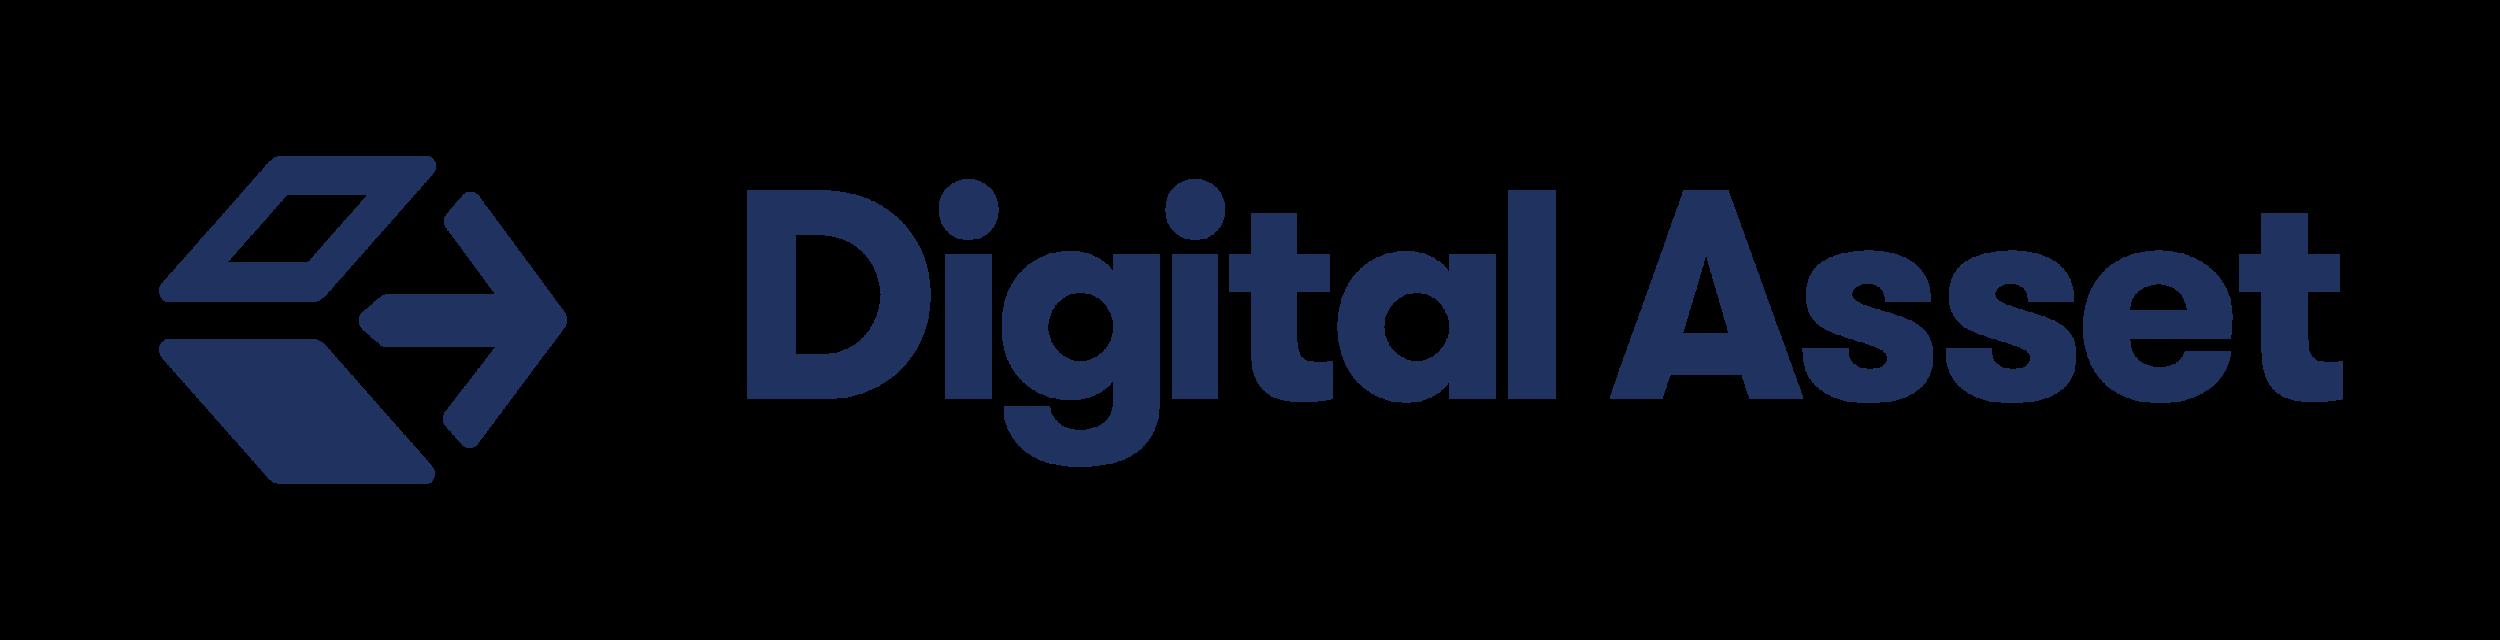 digital asset.png